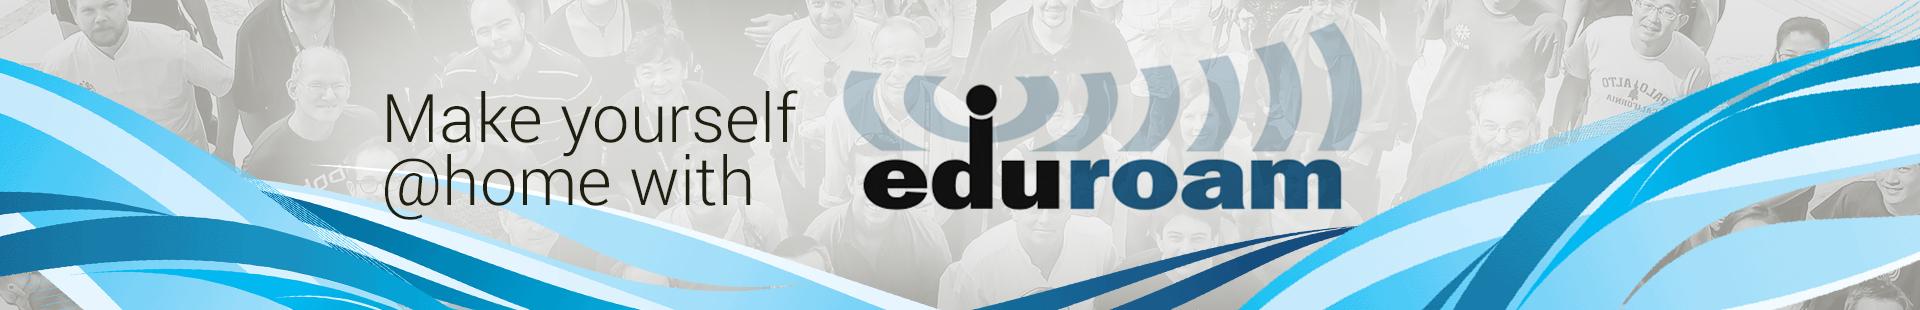 banner-eduroam1